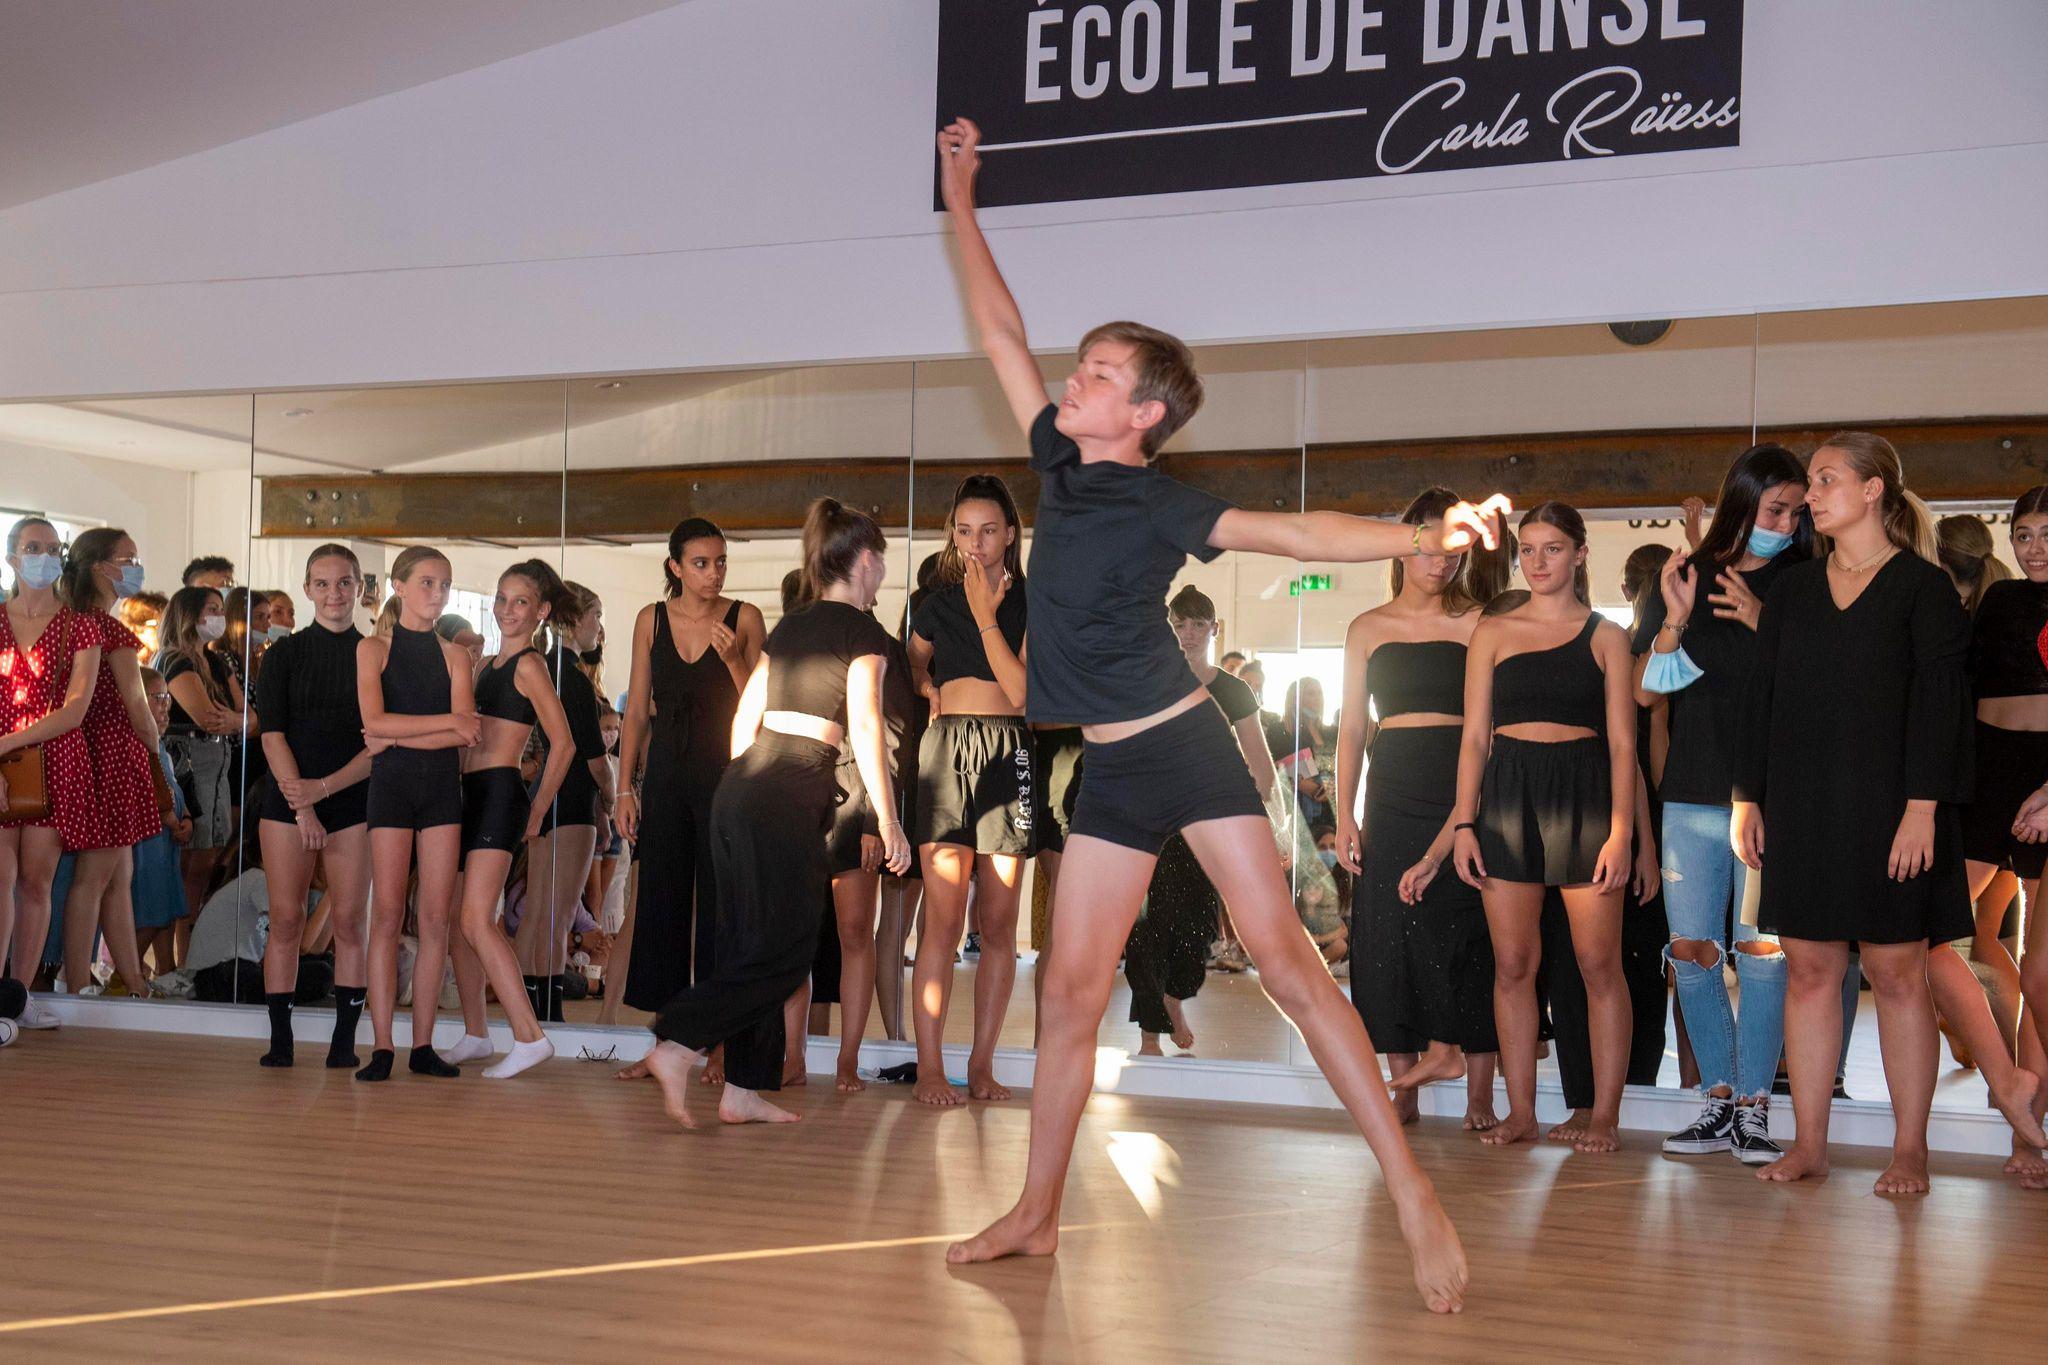 inauguration école de danse carla raiess ollioules